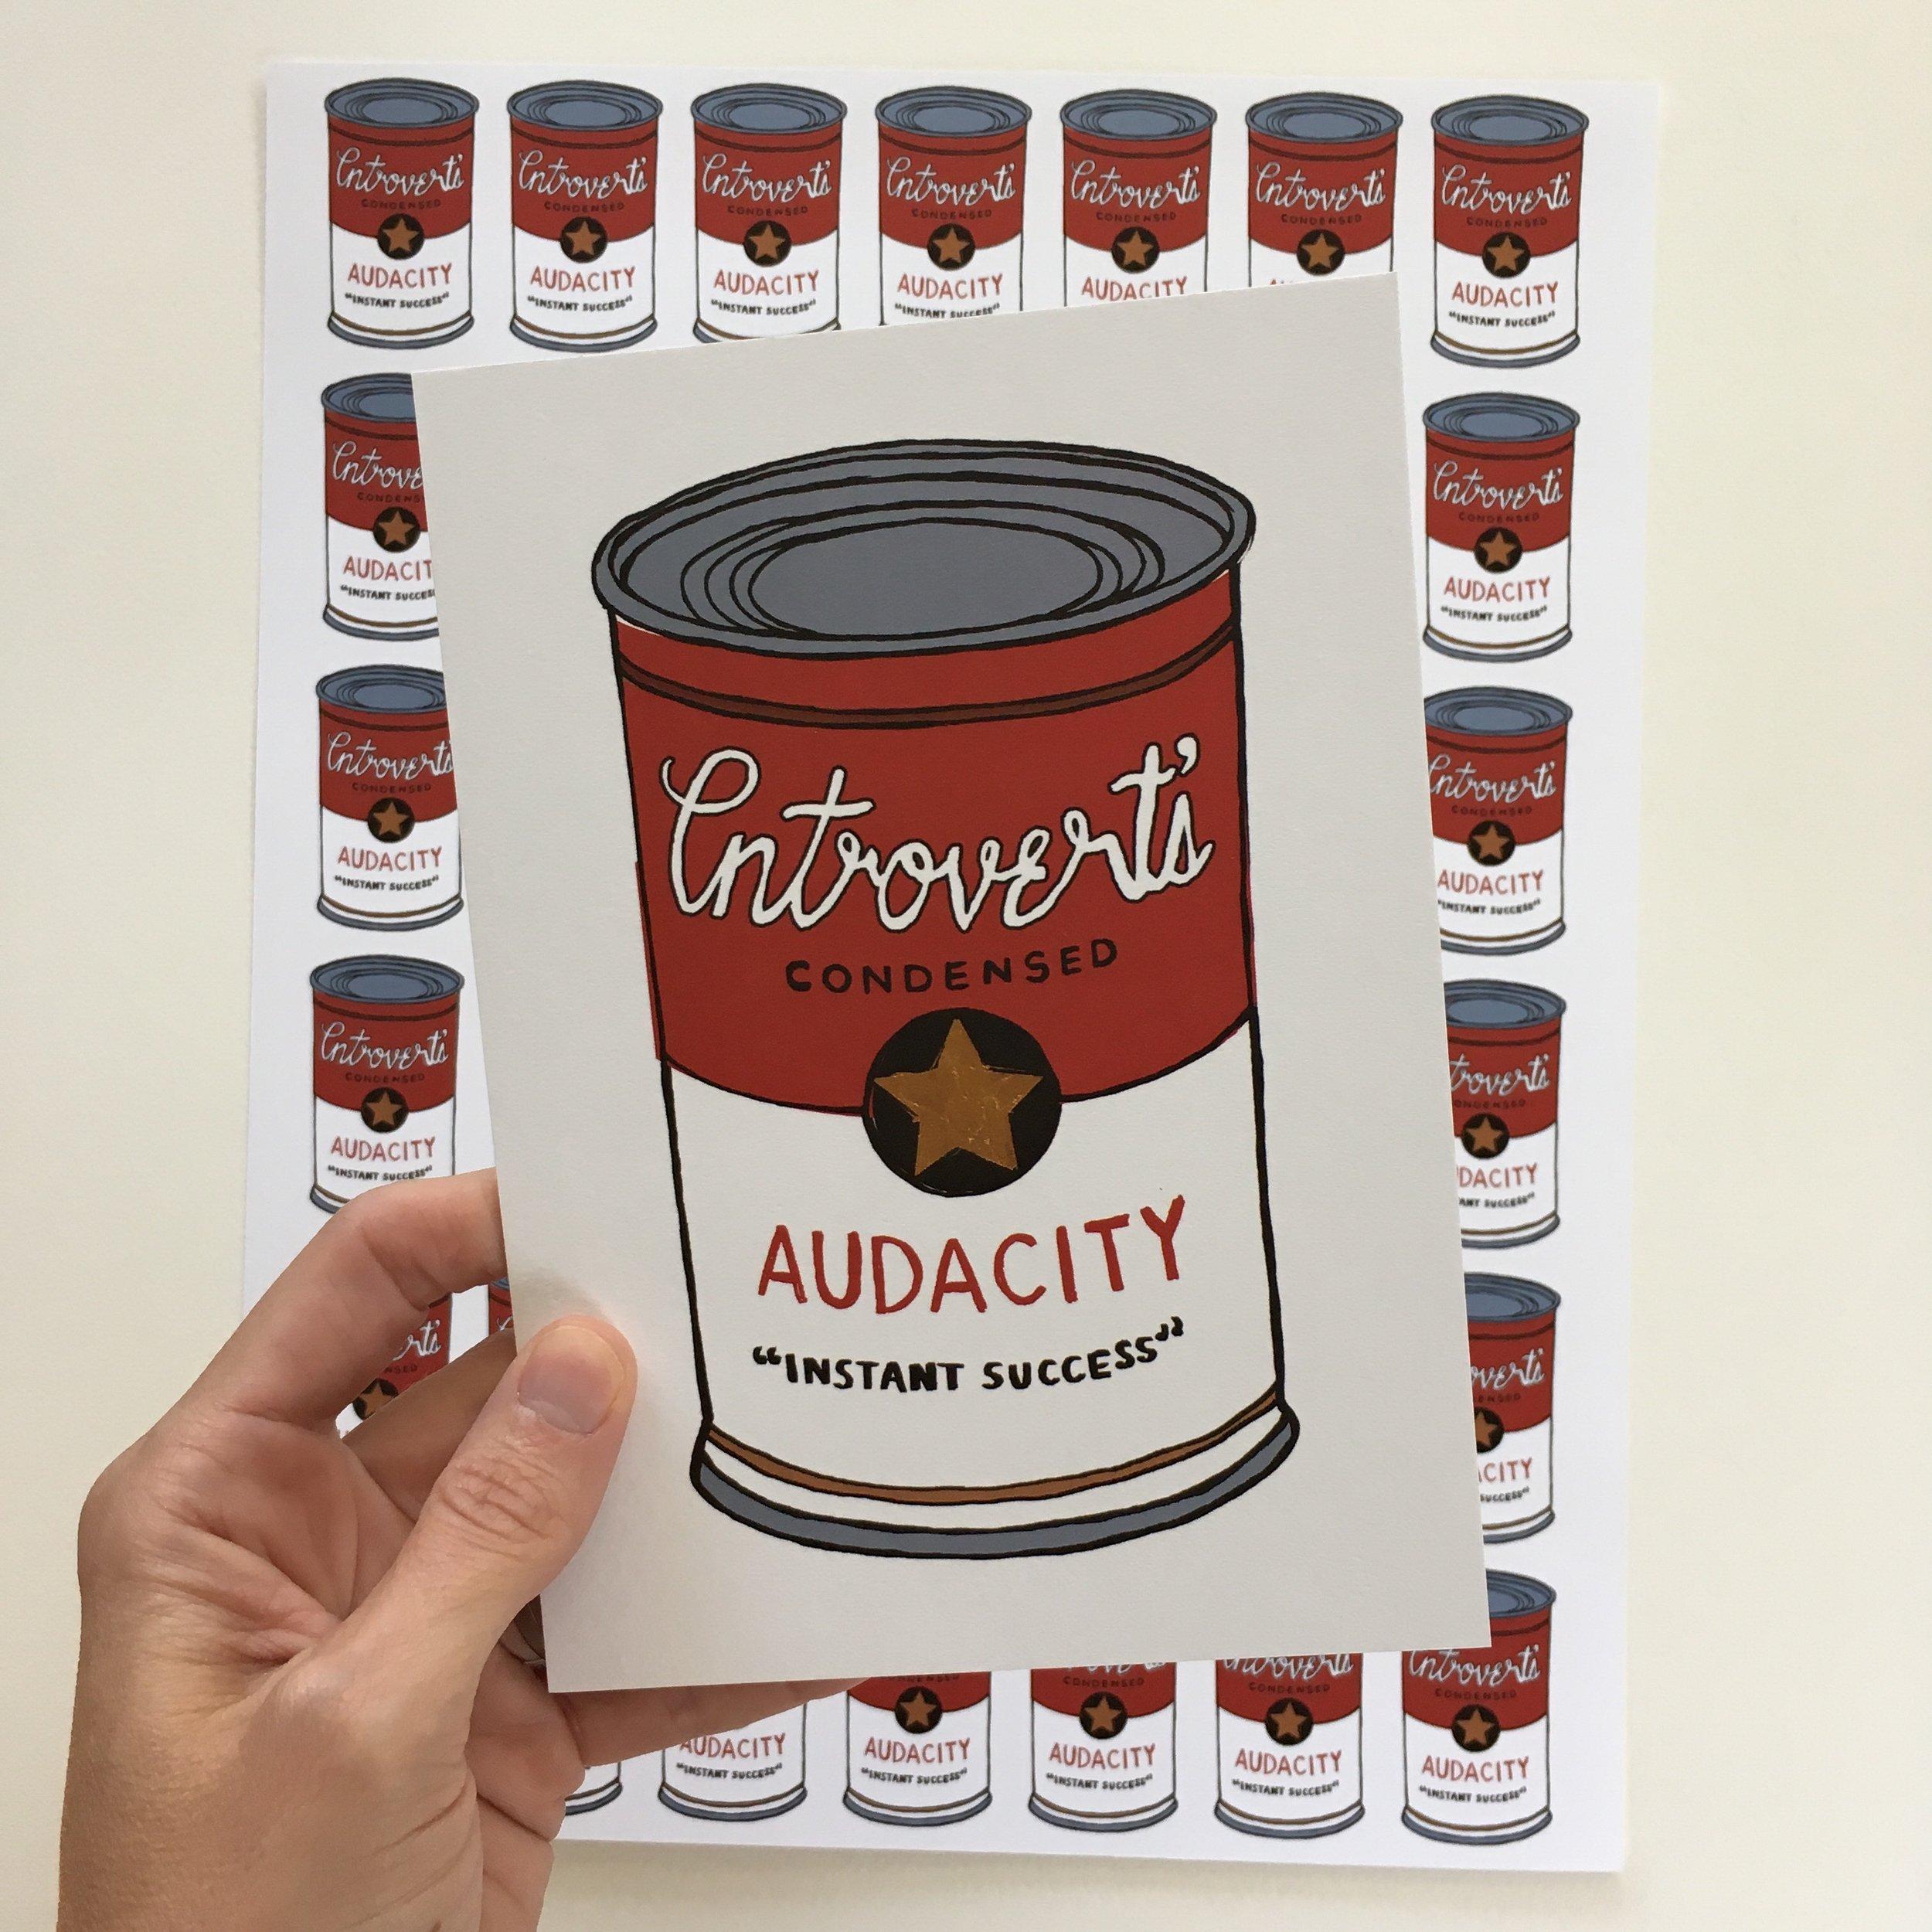 crystal moody | audacity can postcard